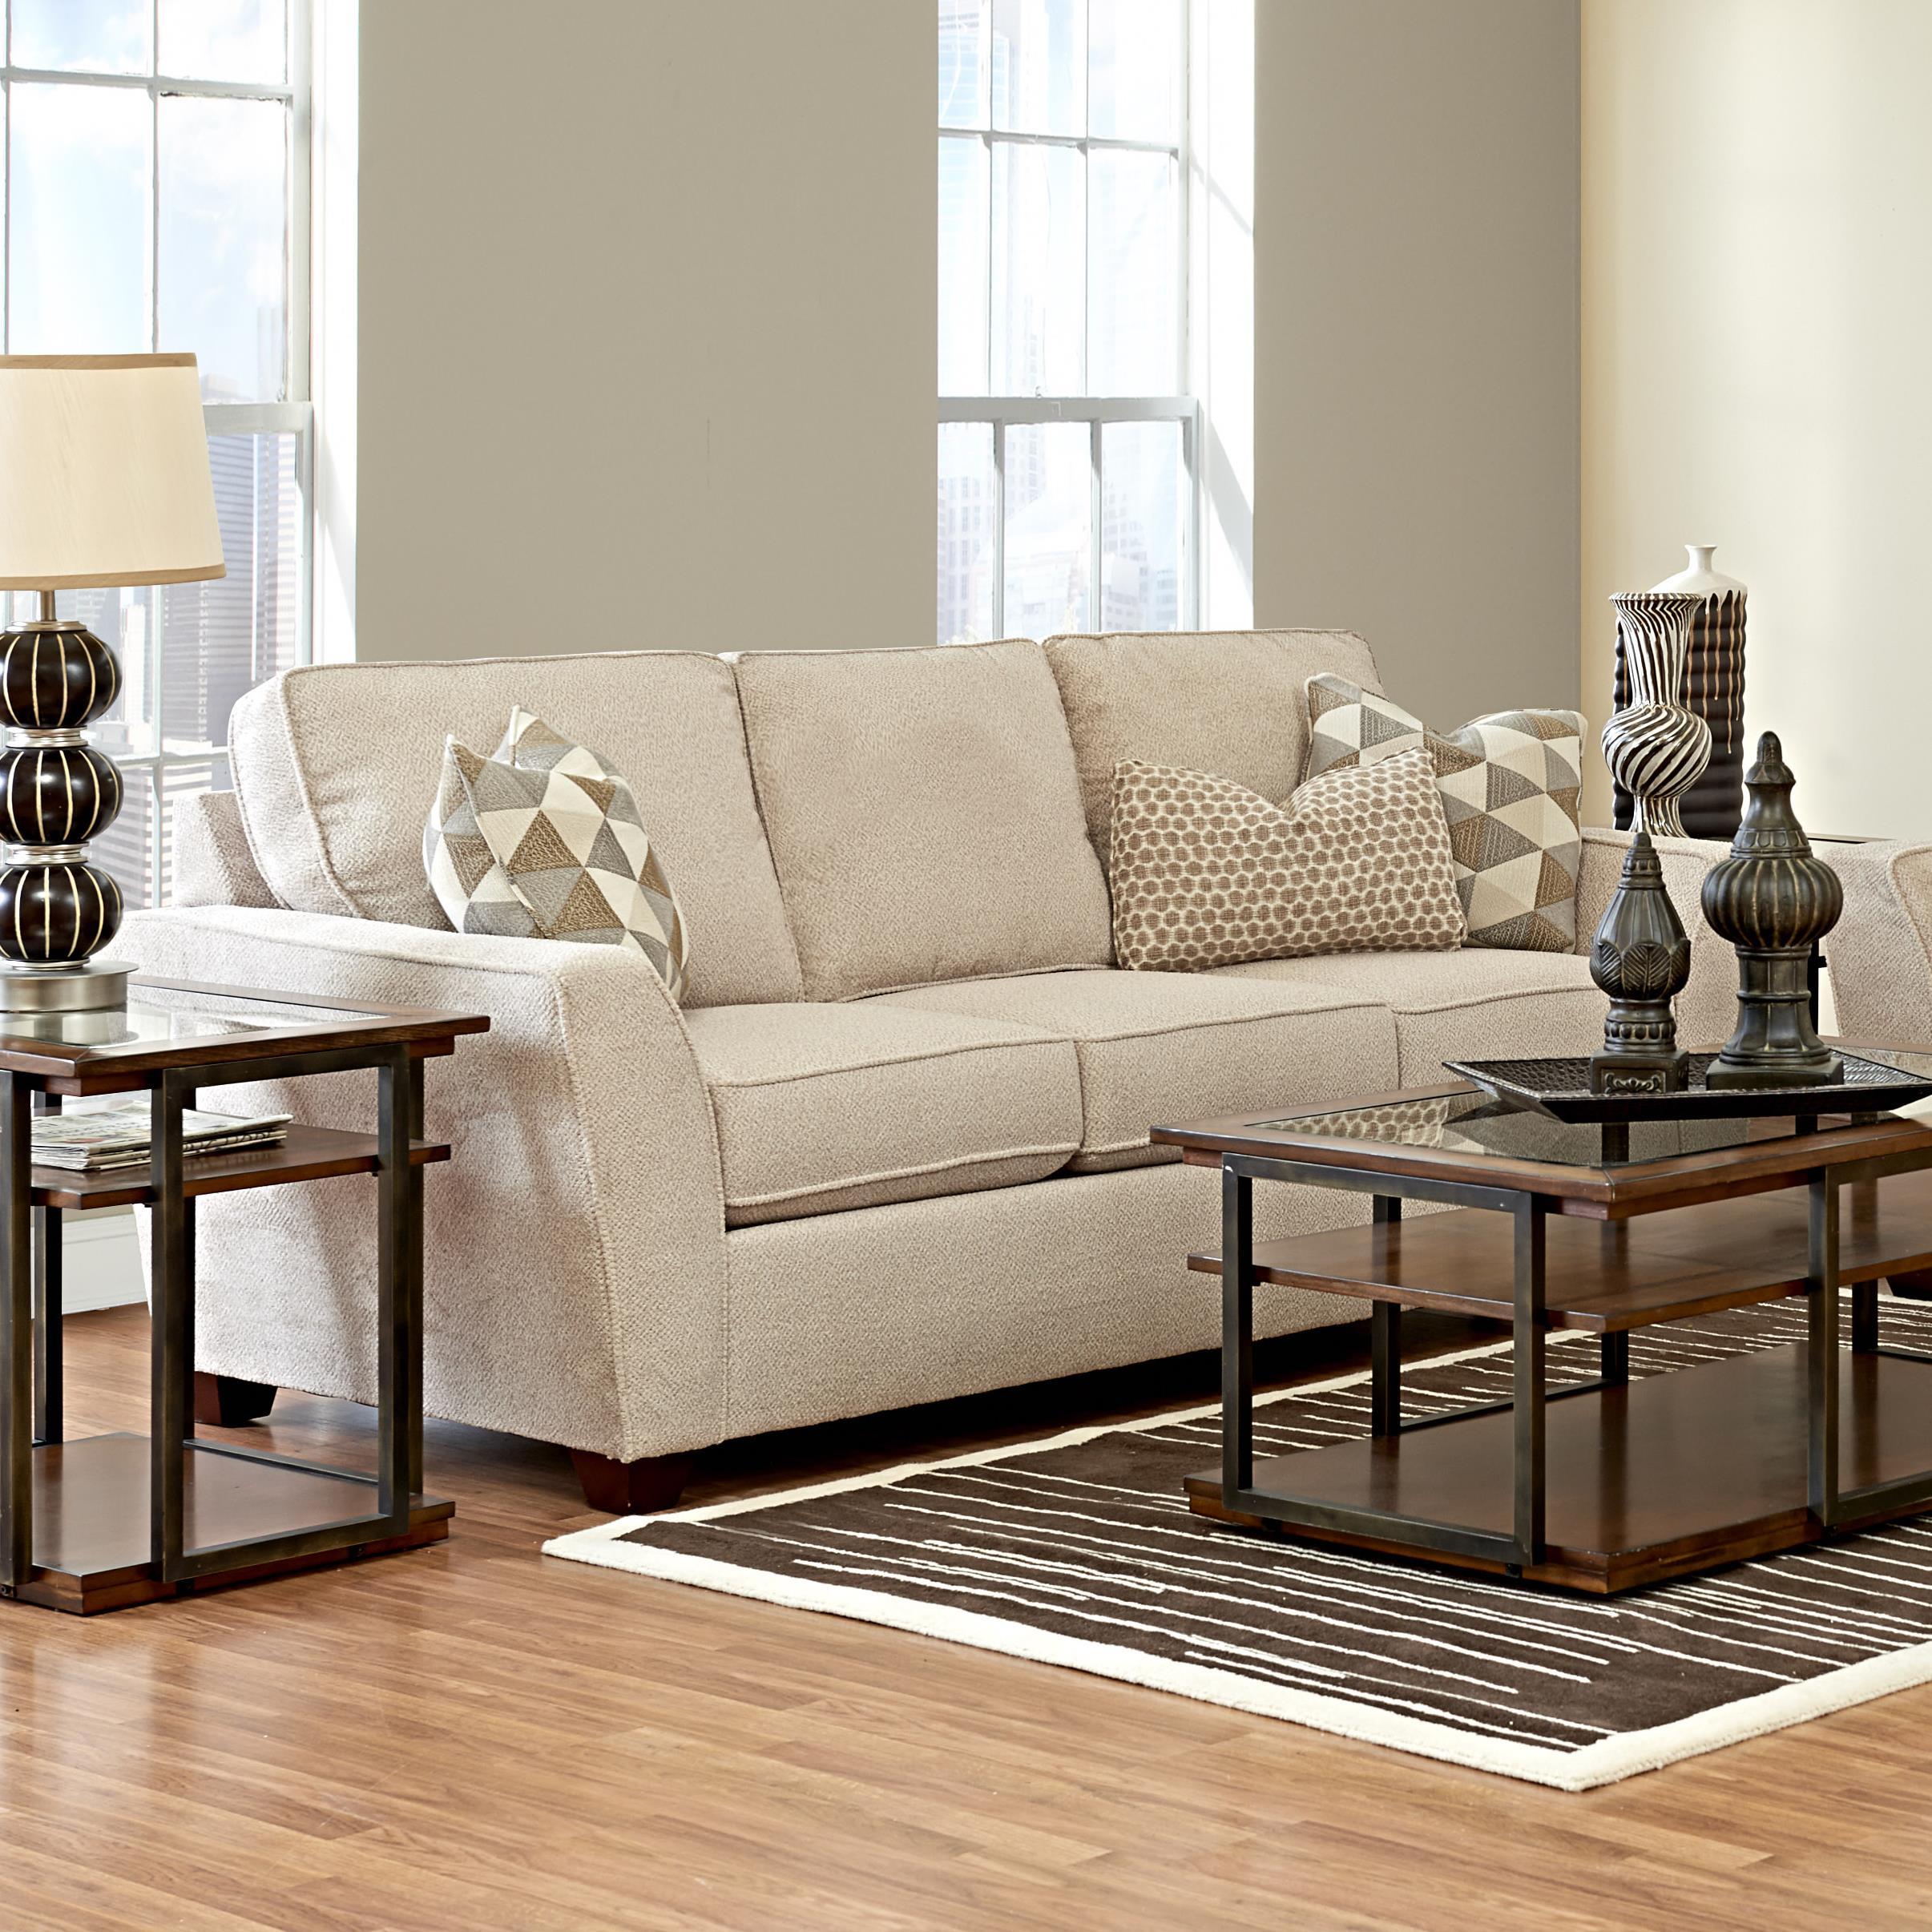 Klaussner Kent Sofa - Item Number: K75600 S-AshbyStone